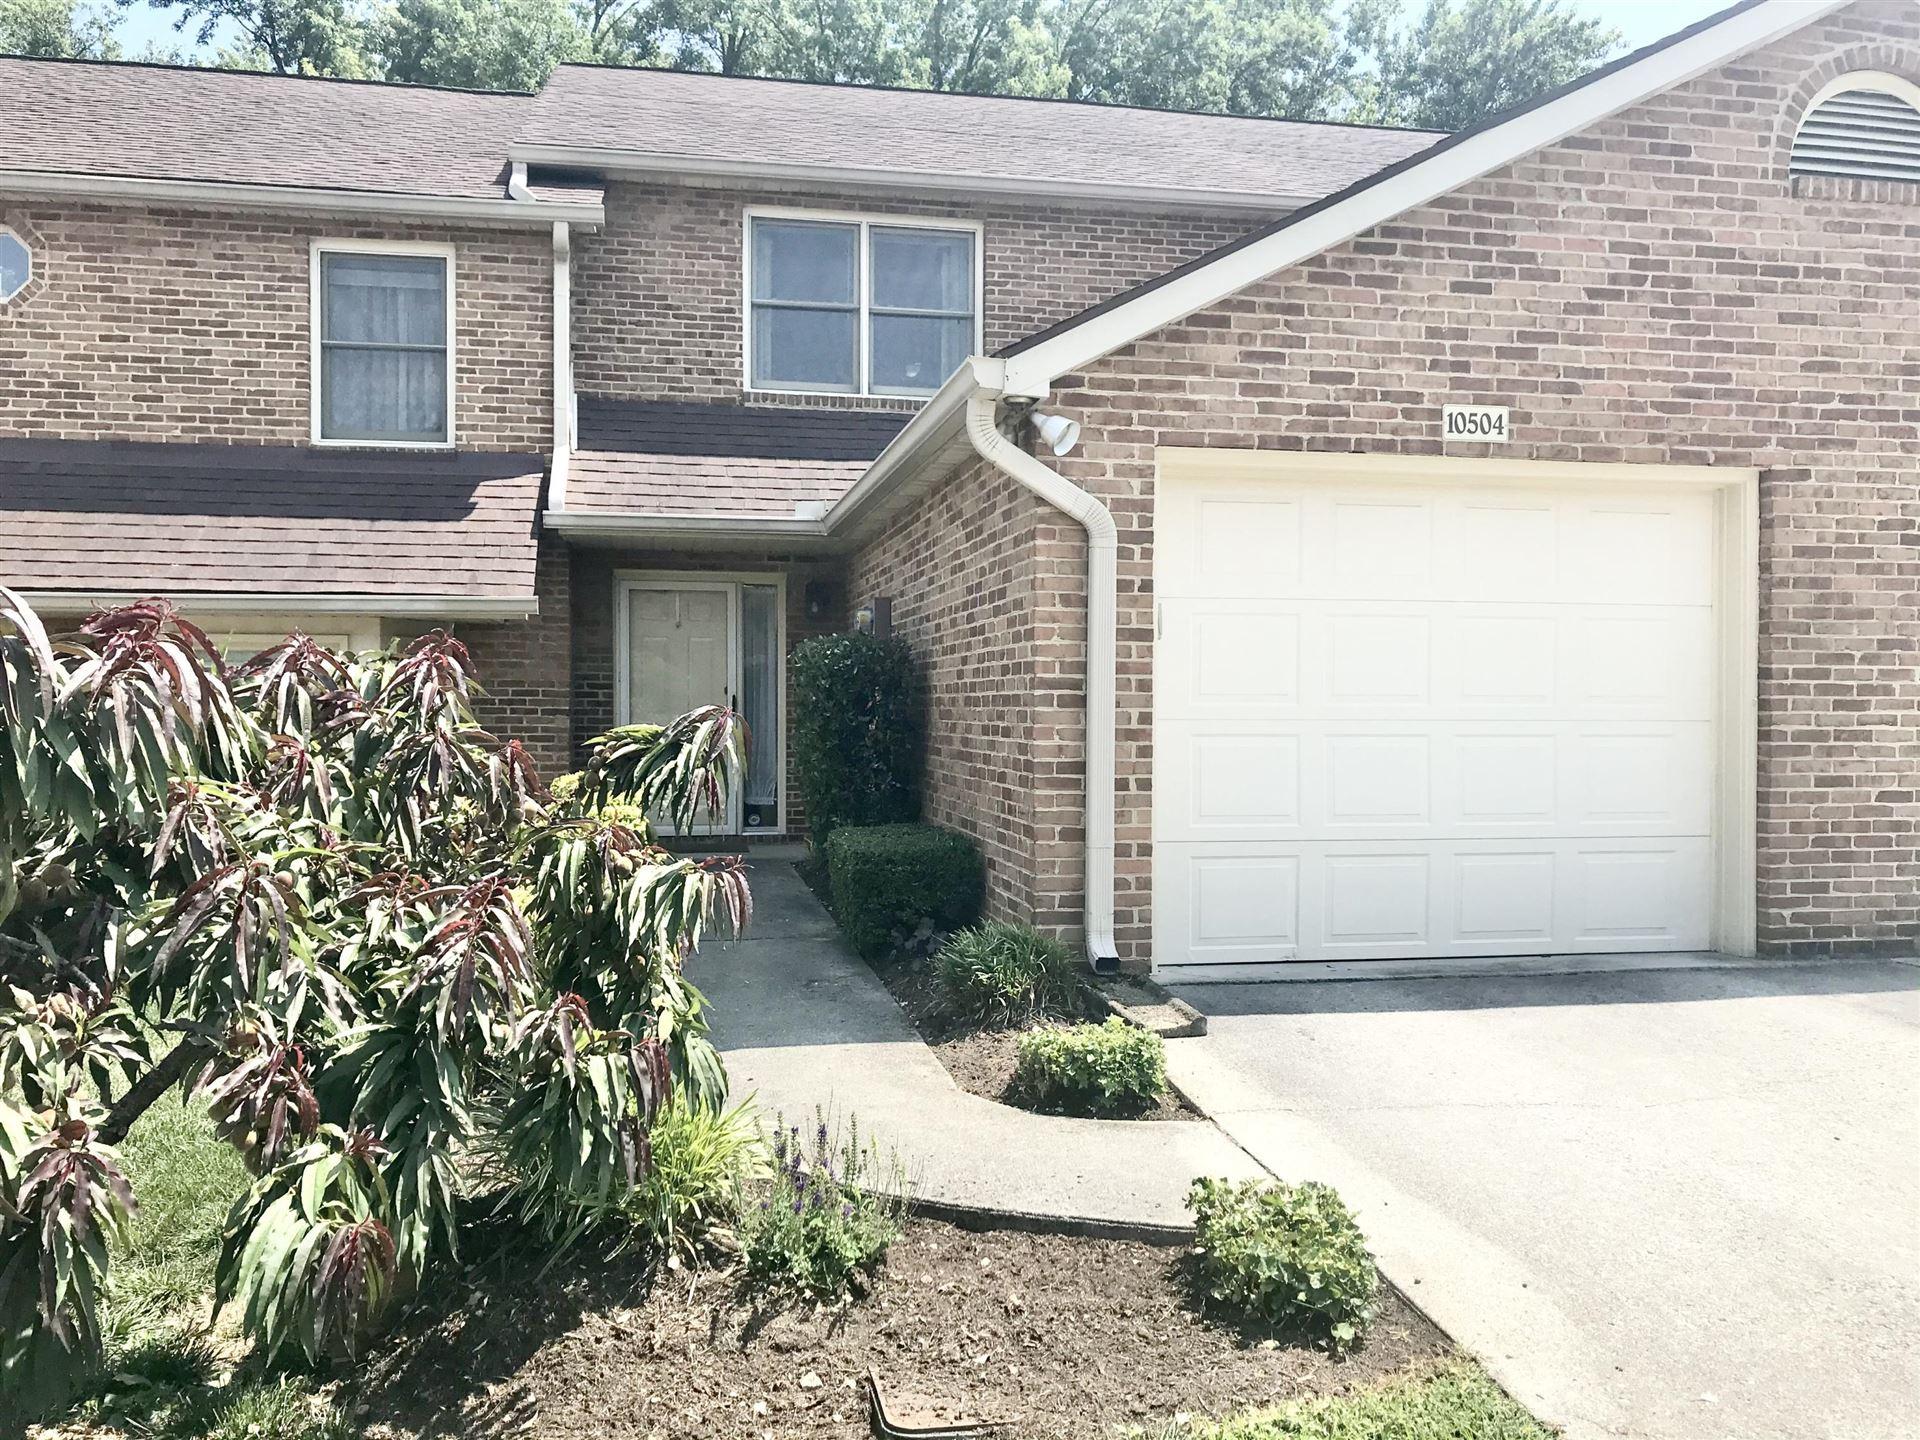 10504 Raven Court, Knoxville, TN 37922 - MLS#: 1160388